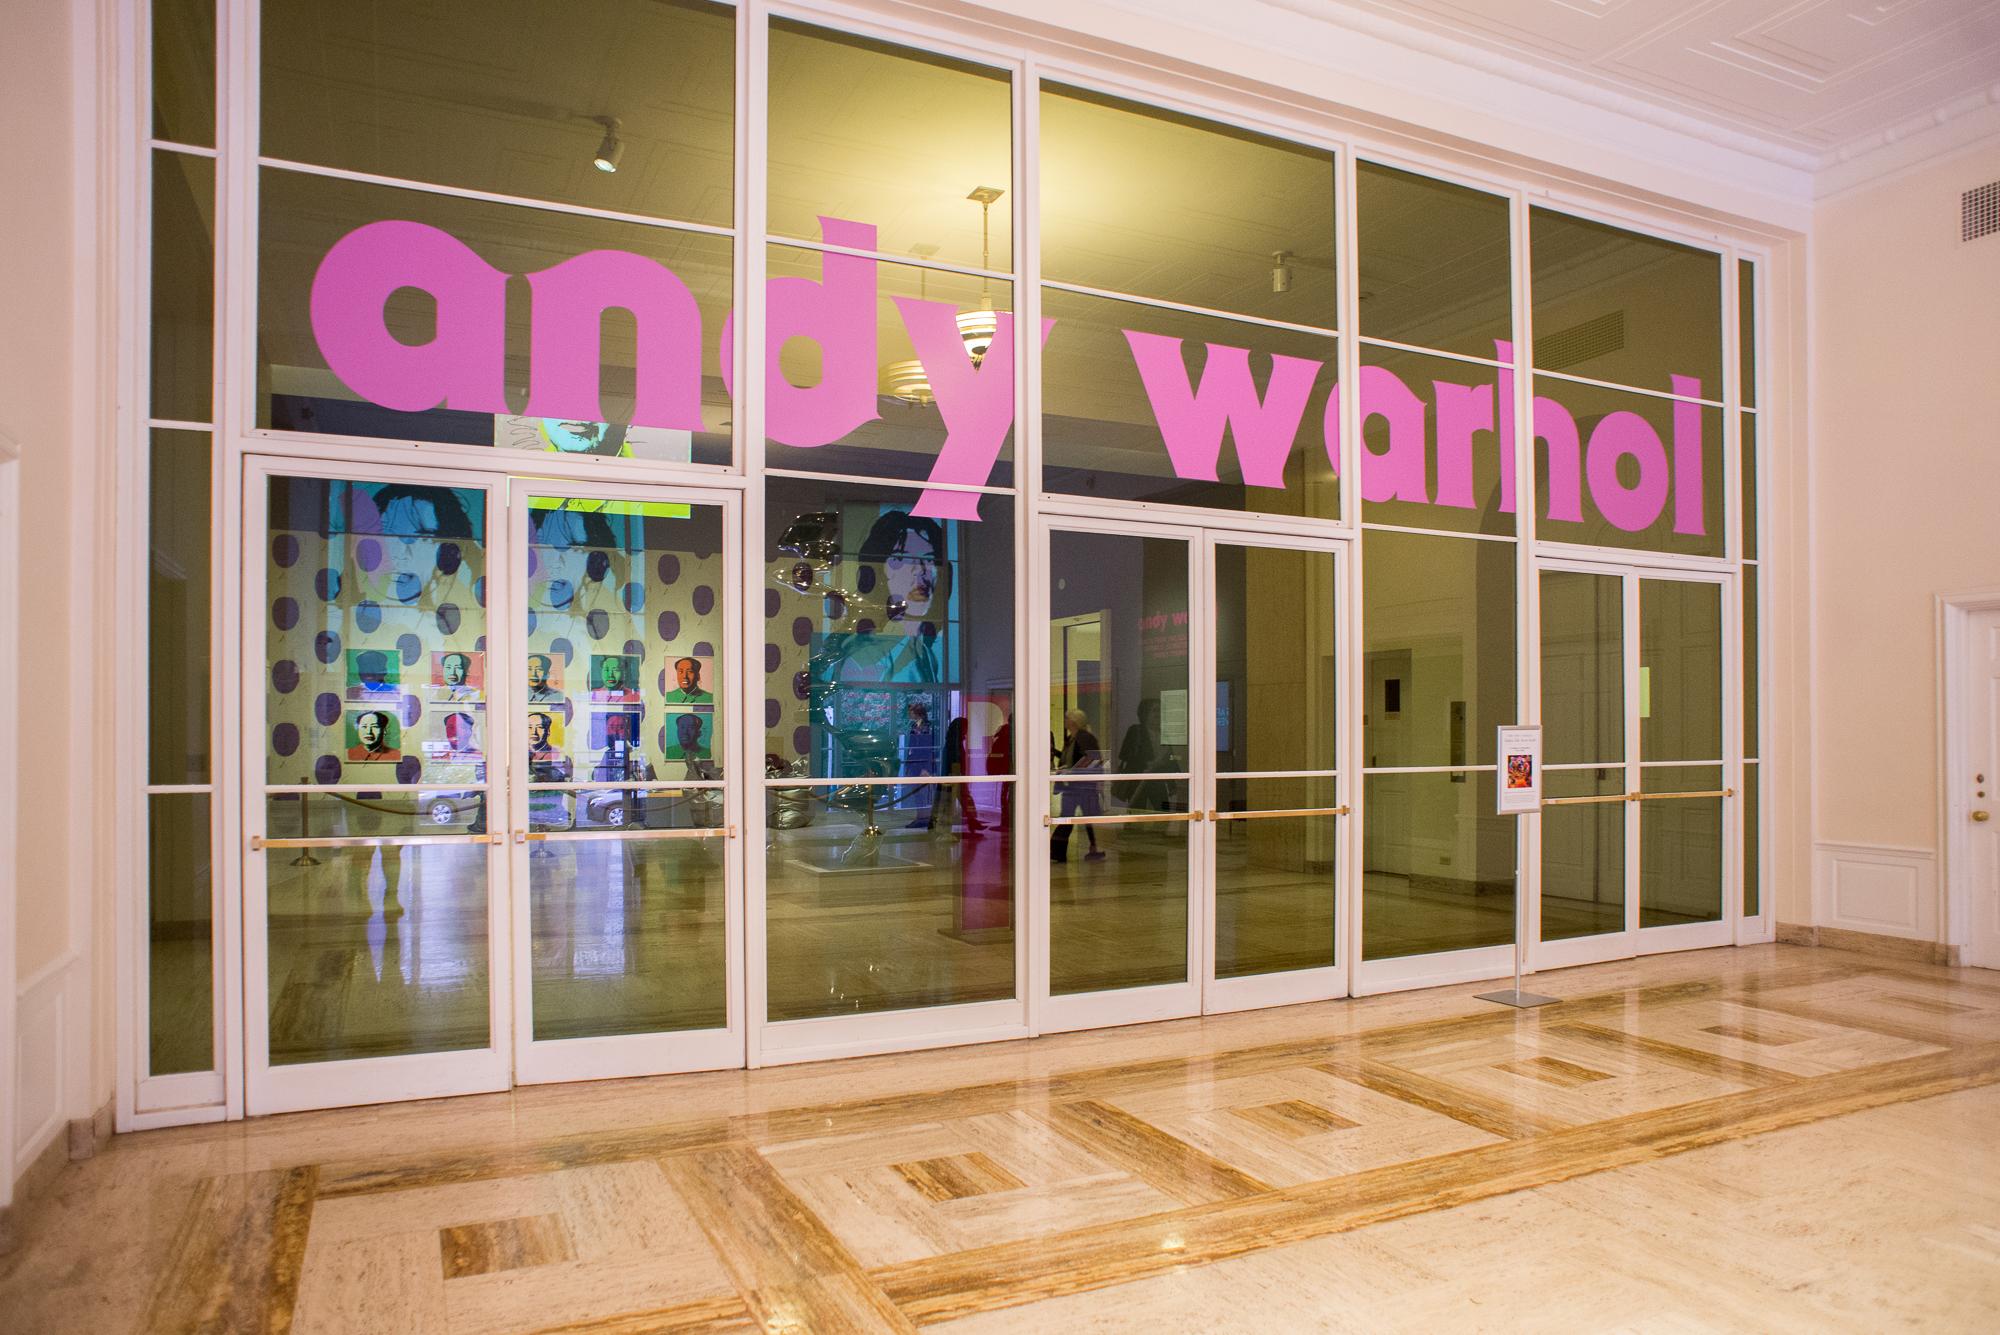 Warhol-Press-Preview-PAM-2016-2.jpg